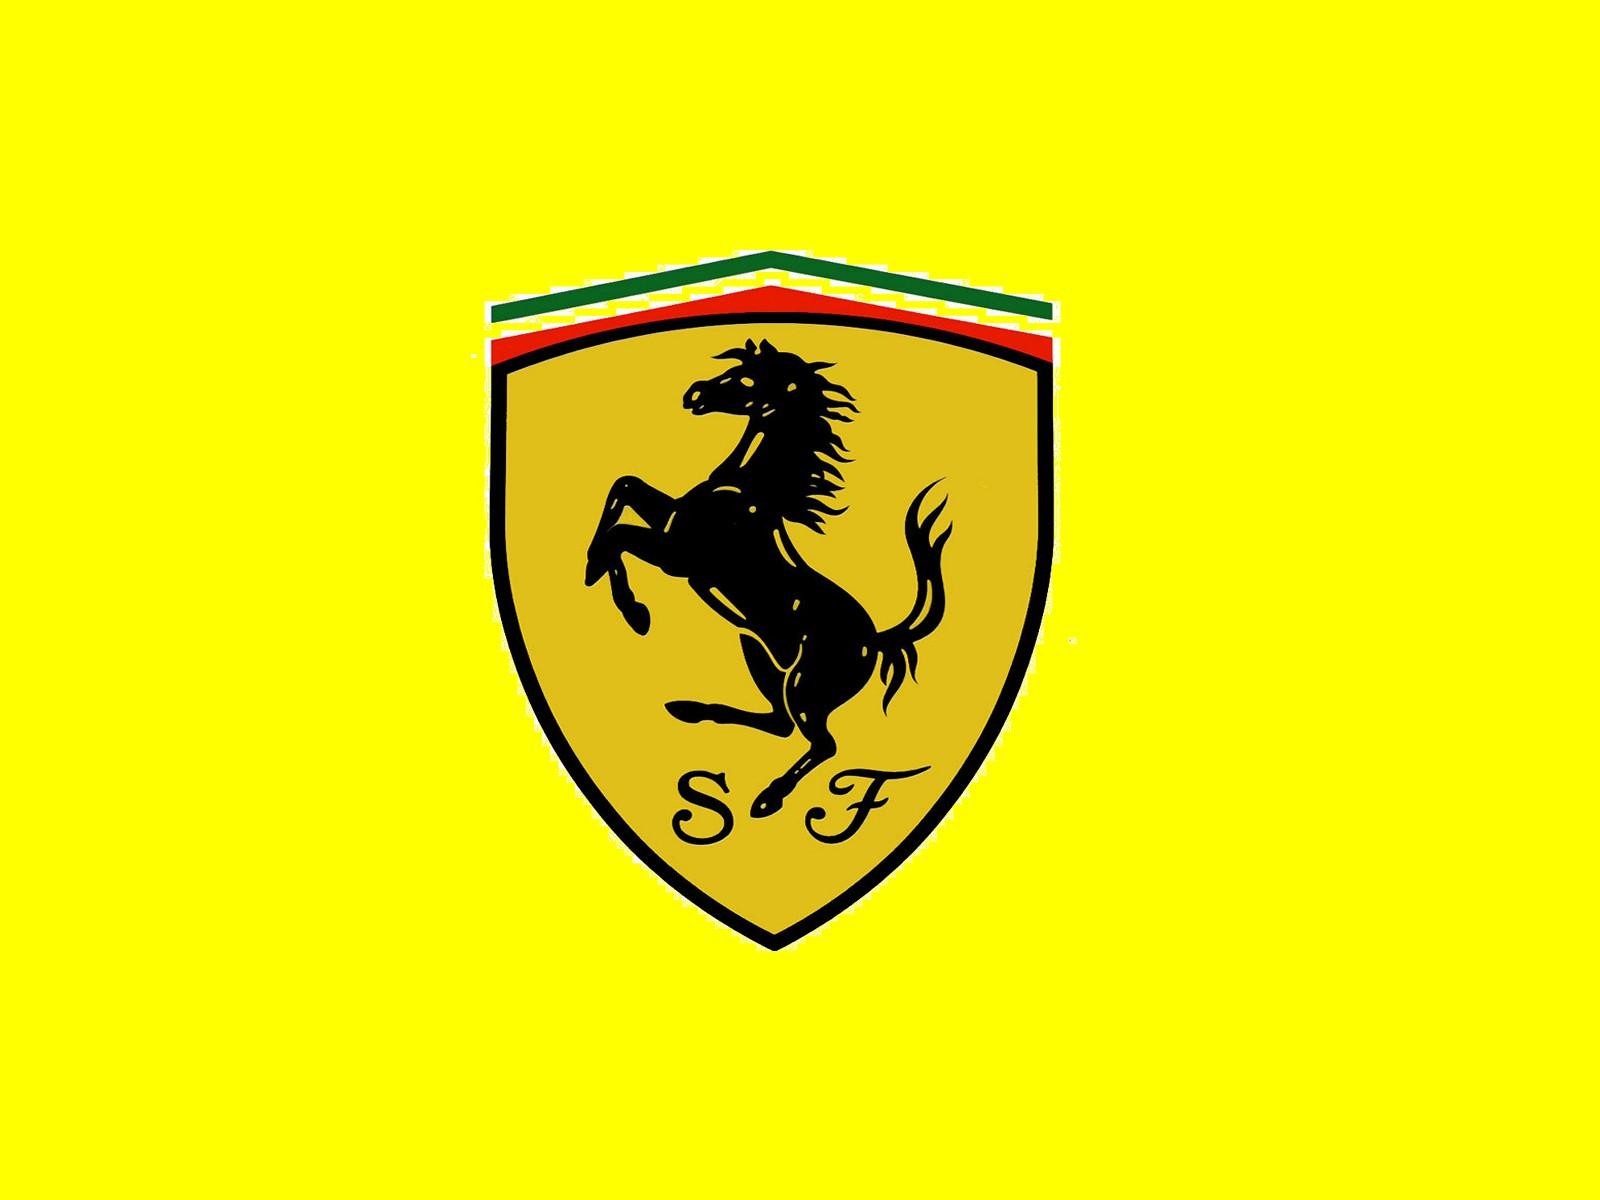 Must see Wallpaper Logo Ferrari - ferrari-logo-wallpaper-36210-37035-hd-wallpapers  Graphic_976455.jpg